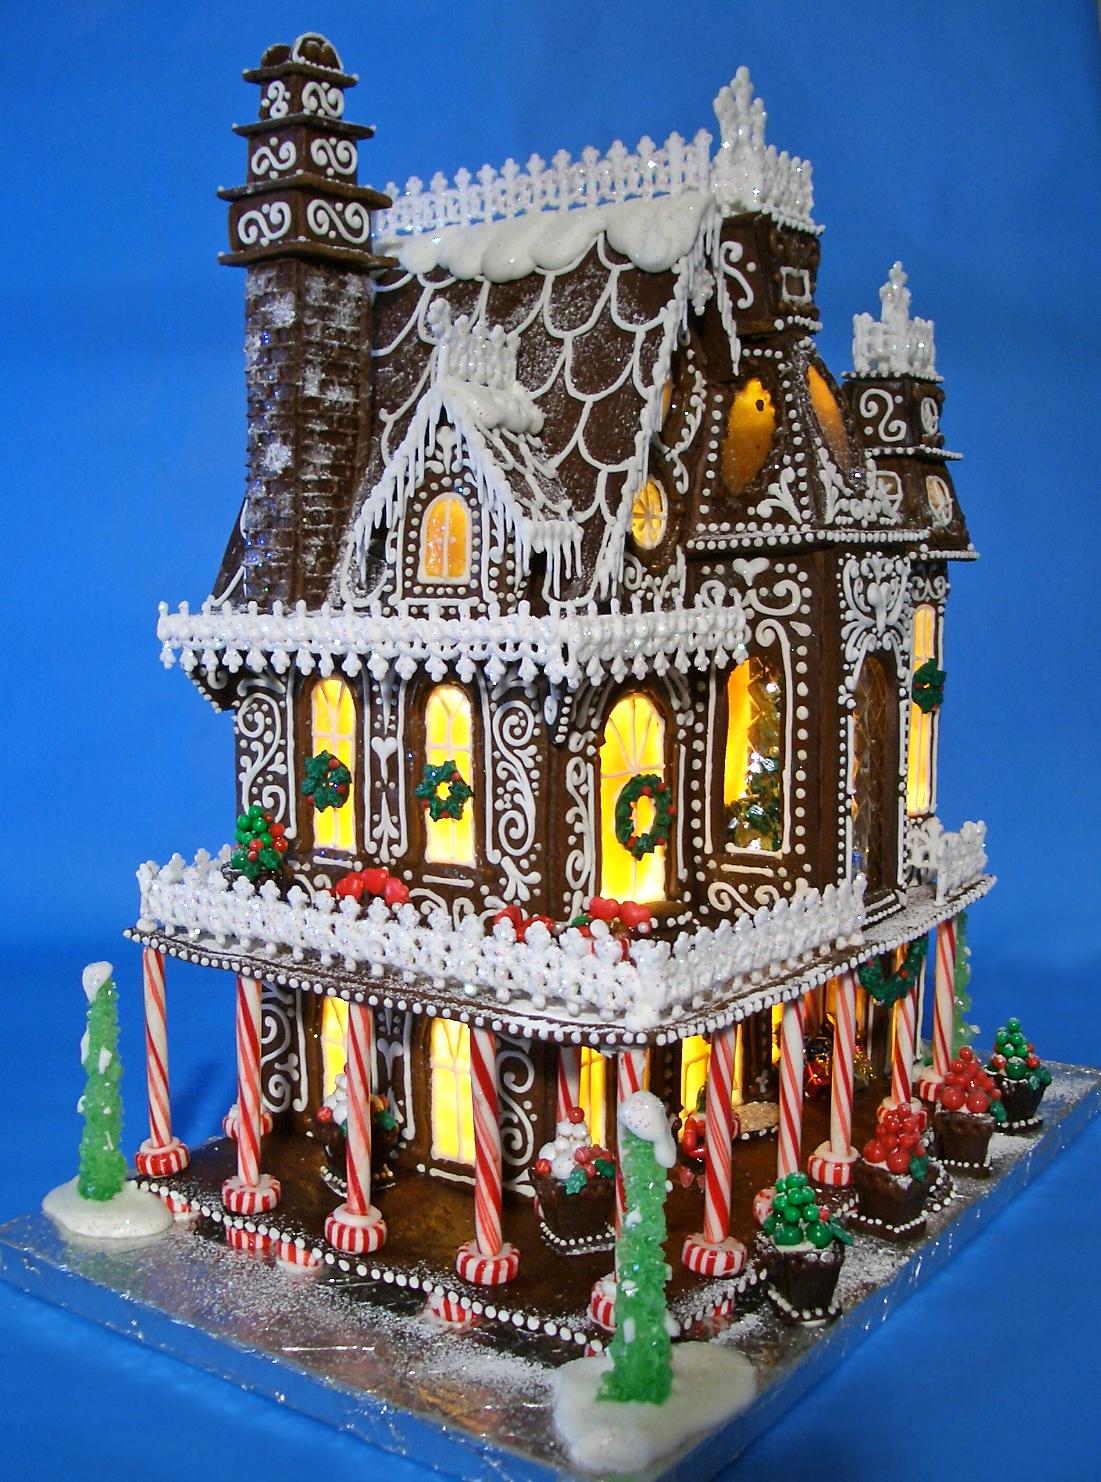 Gingerbread House 2014 - Goos By Anna on fudge box, ginger box, brownies box, cookie dough box, halloween box, gumbo box, rose box, church box, cupcake house box, biscotti box, pig roast box, candy box, text box, fireplace box, ornament box, icing box, panettone box, giveaway box, butterfly box, tiramisu box,